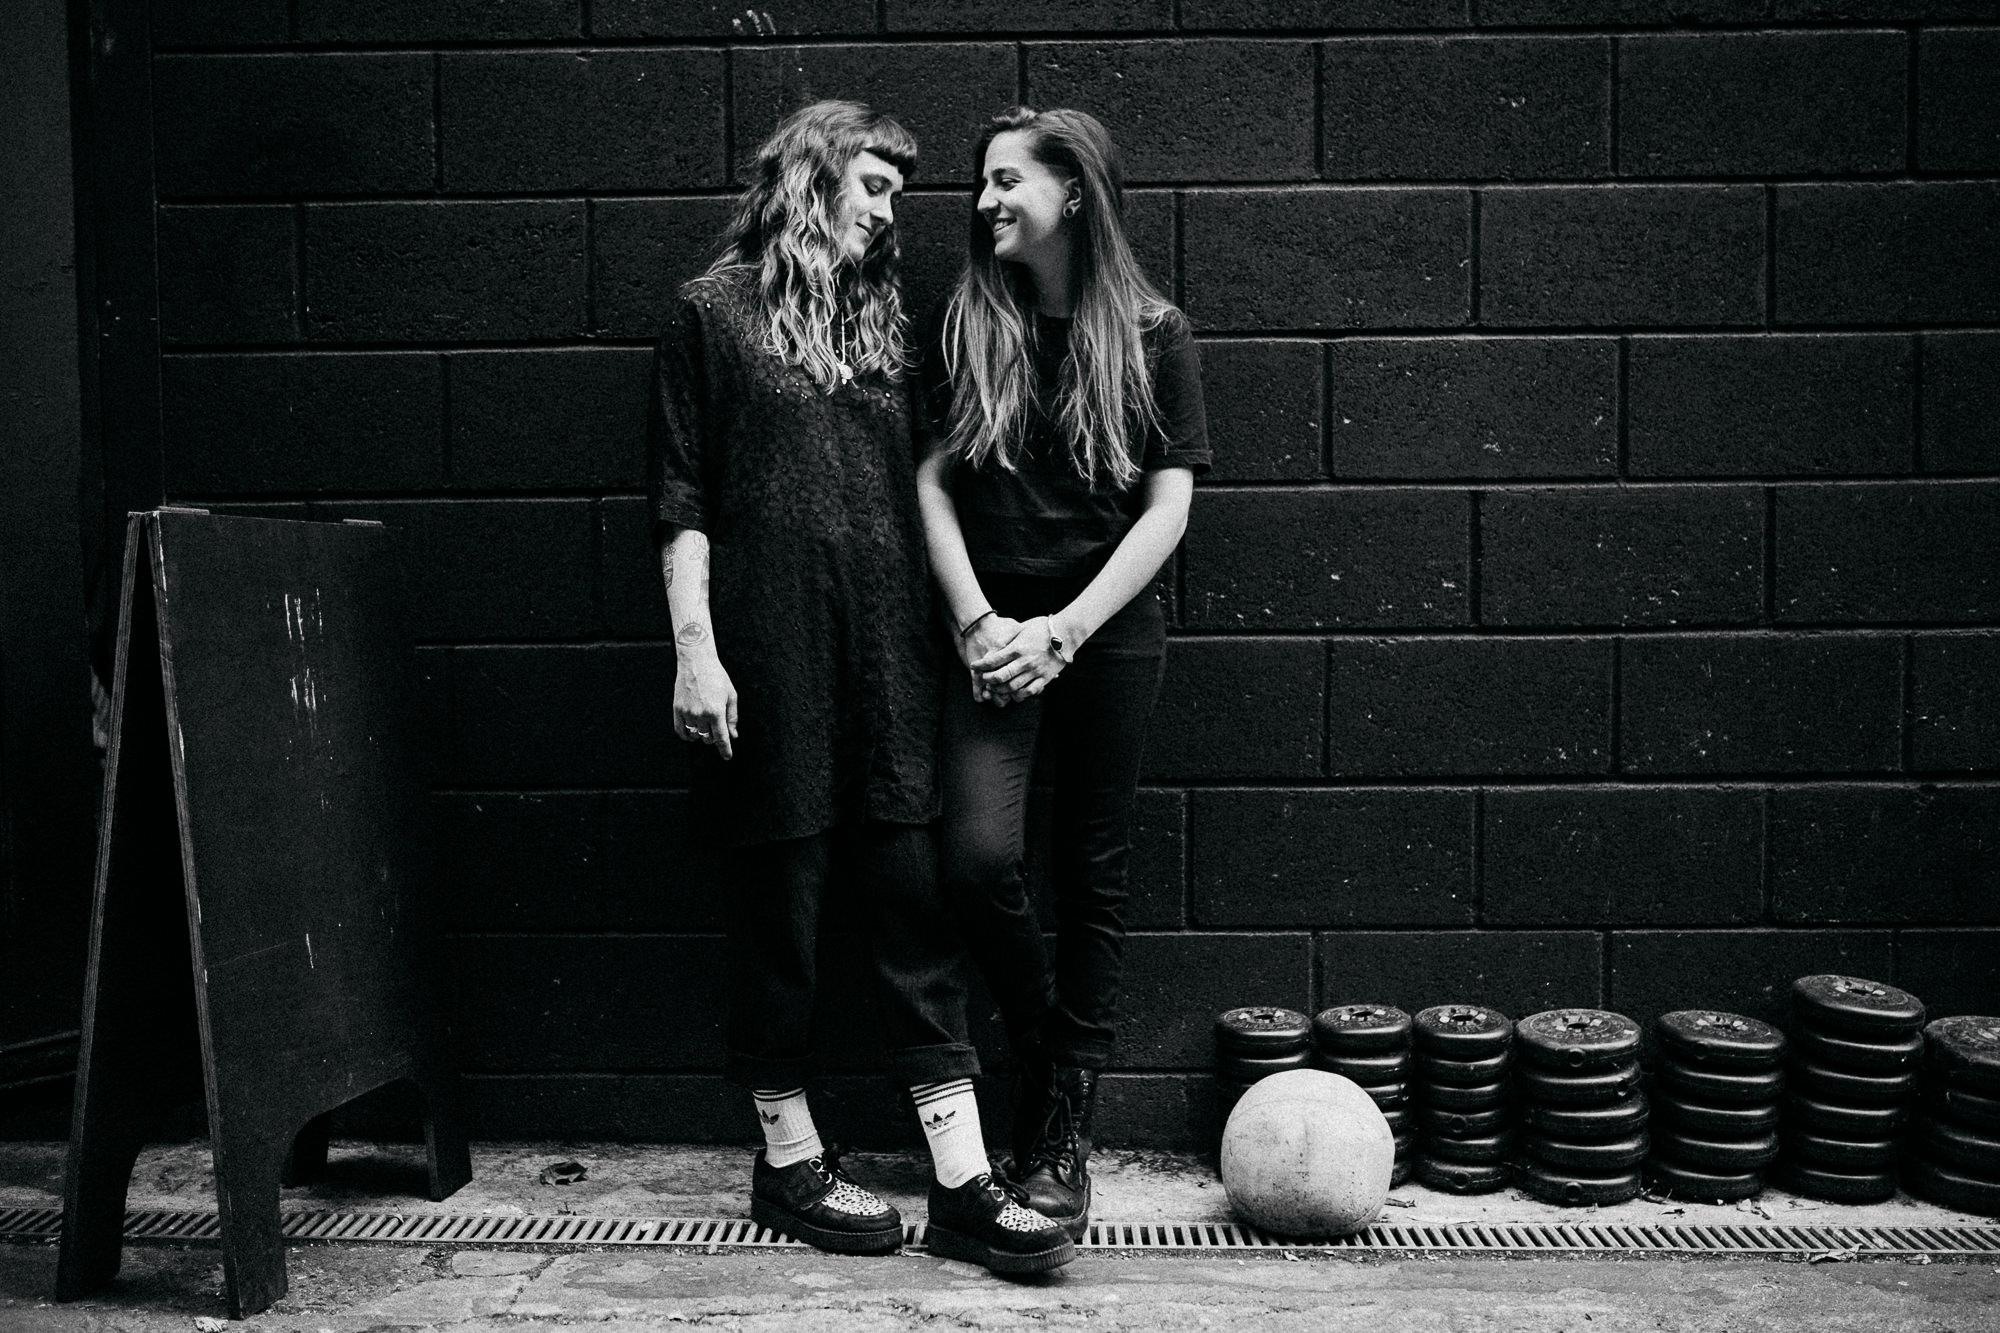 Urbanes Couple-Fotostory in Hamburg von Alina Atzler Fotografie